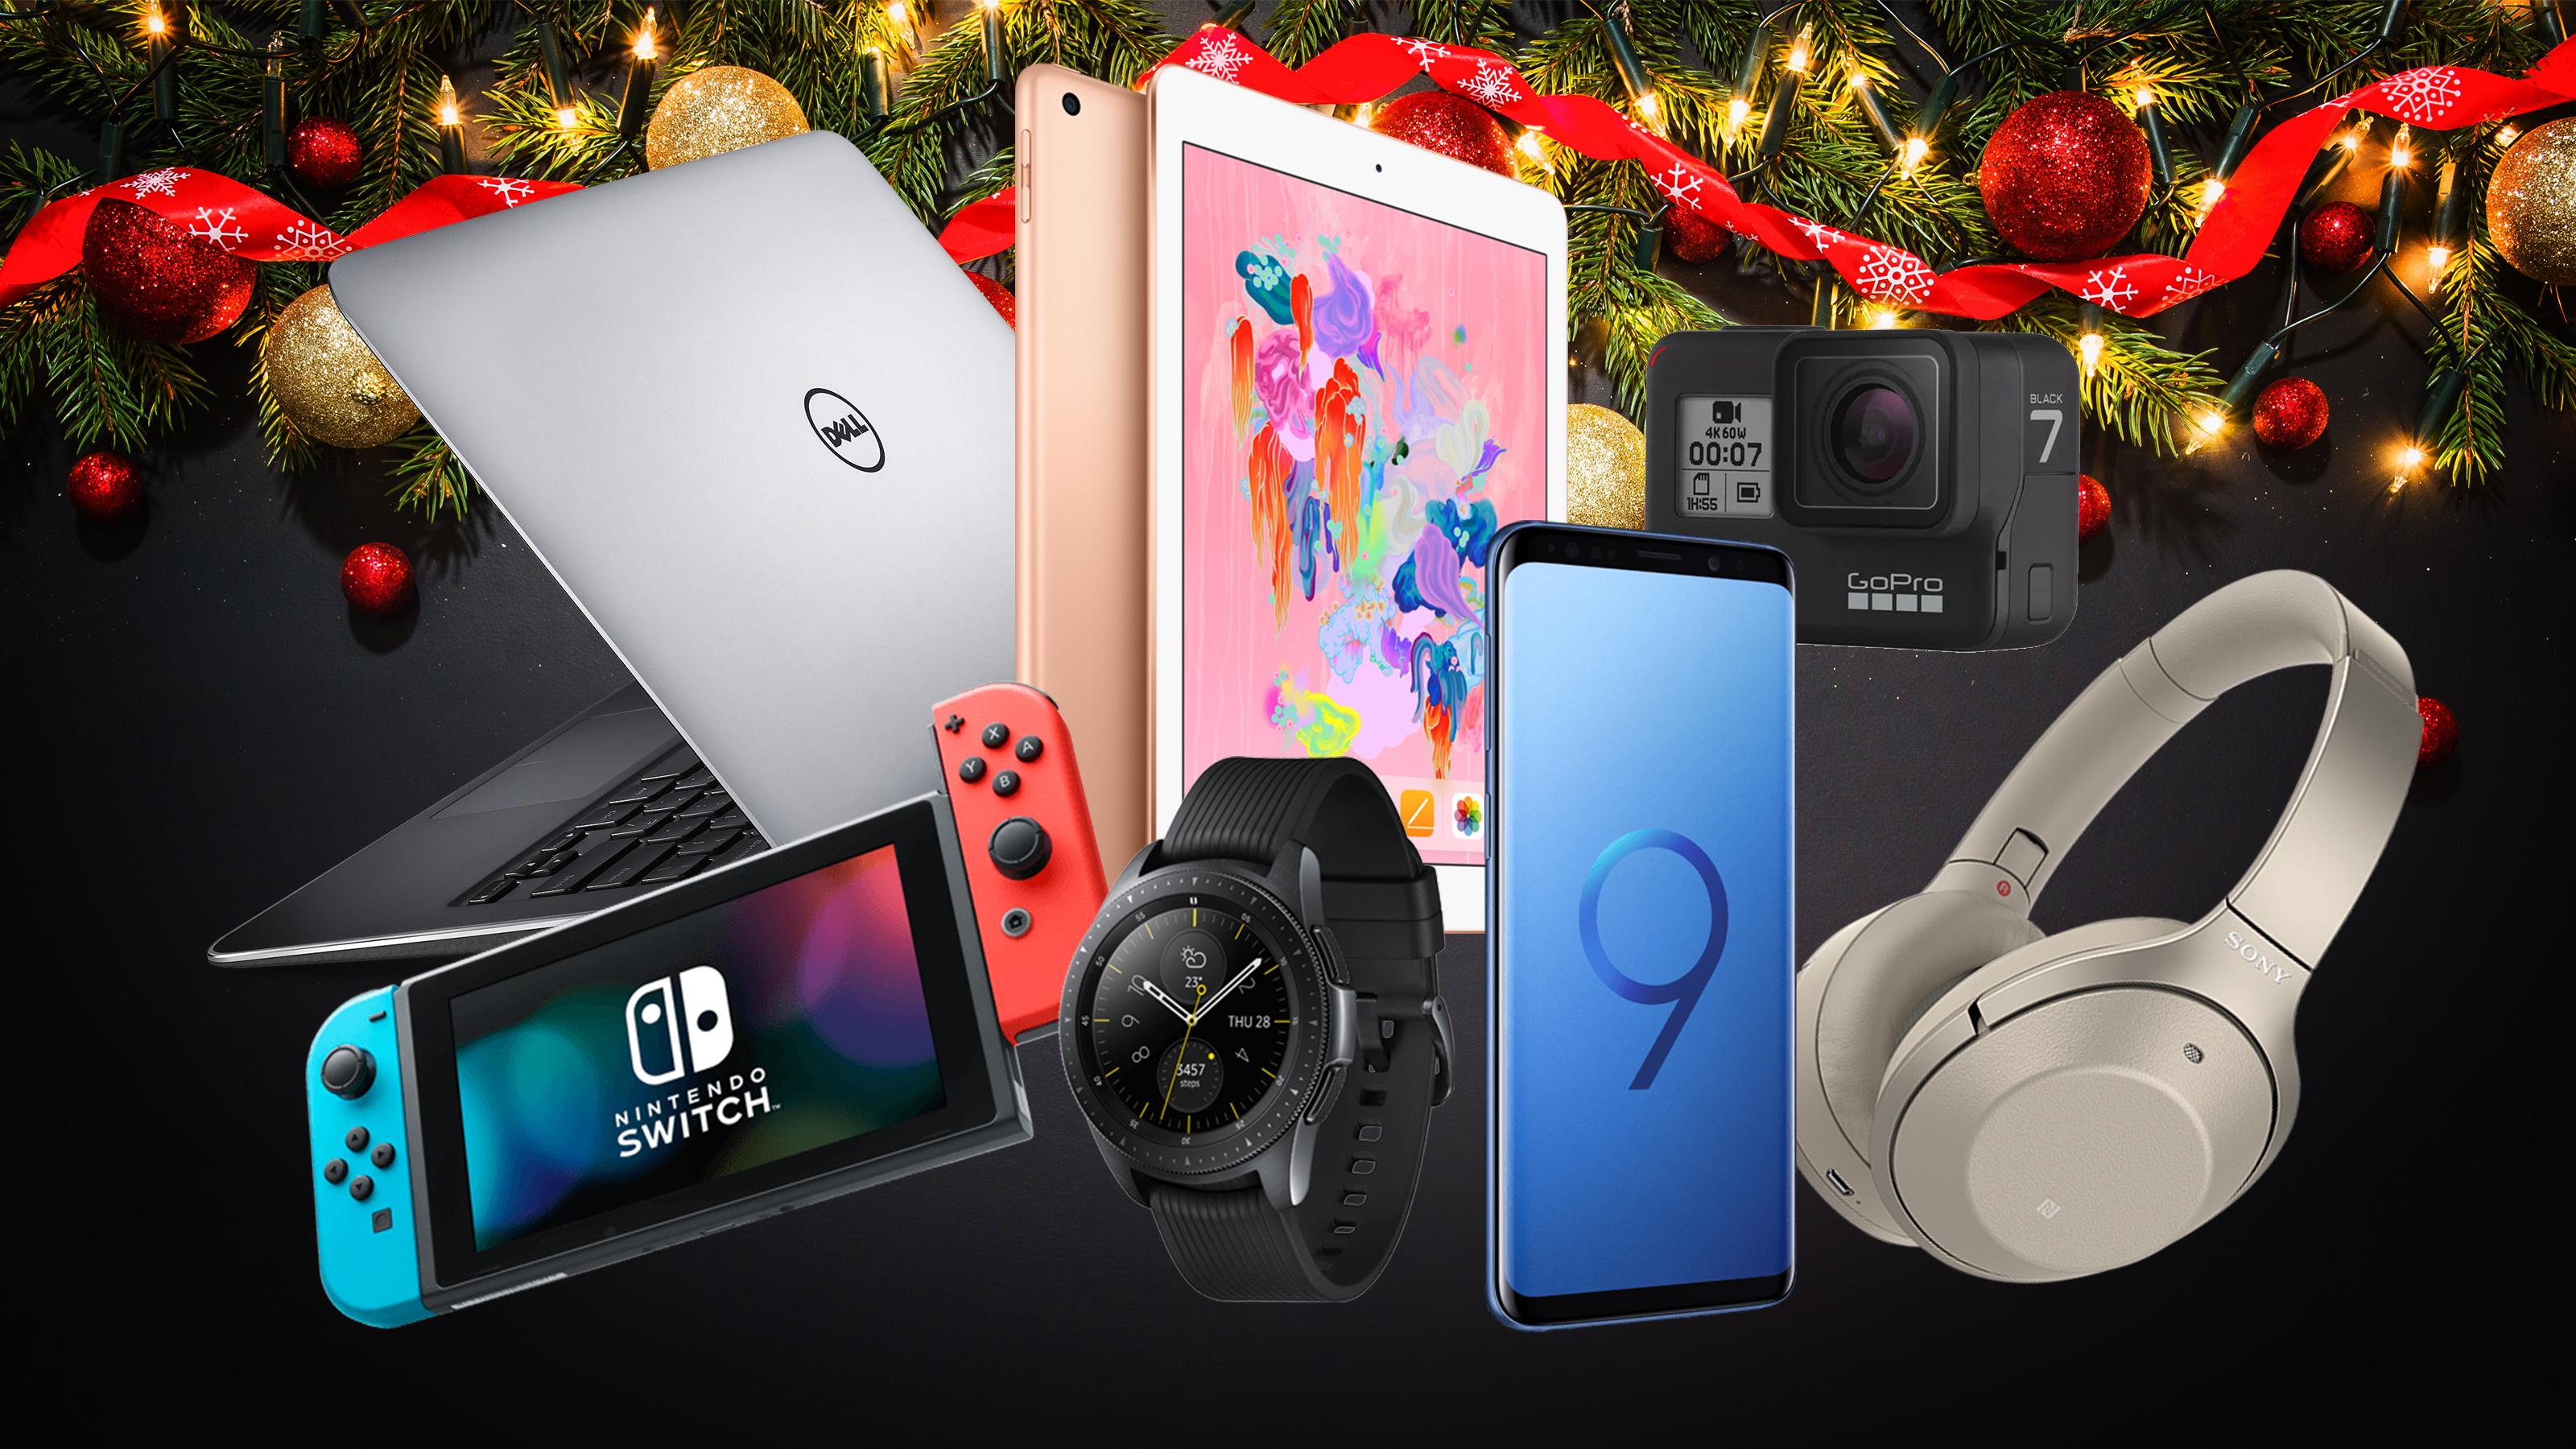 TechRadar's ultimate Christmas guide: have yourself a very techy Christmas